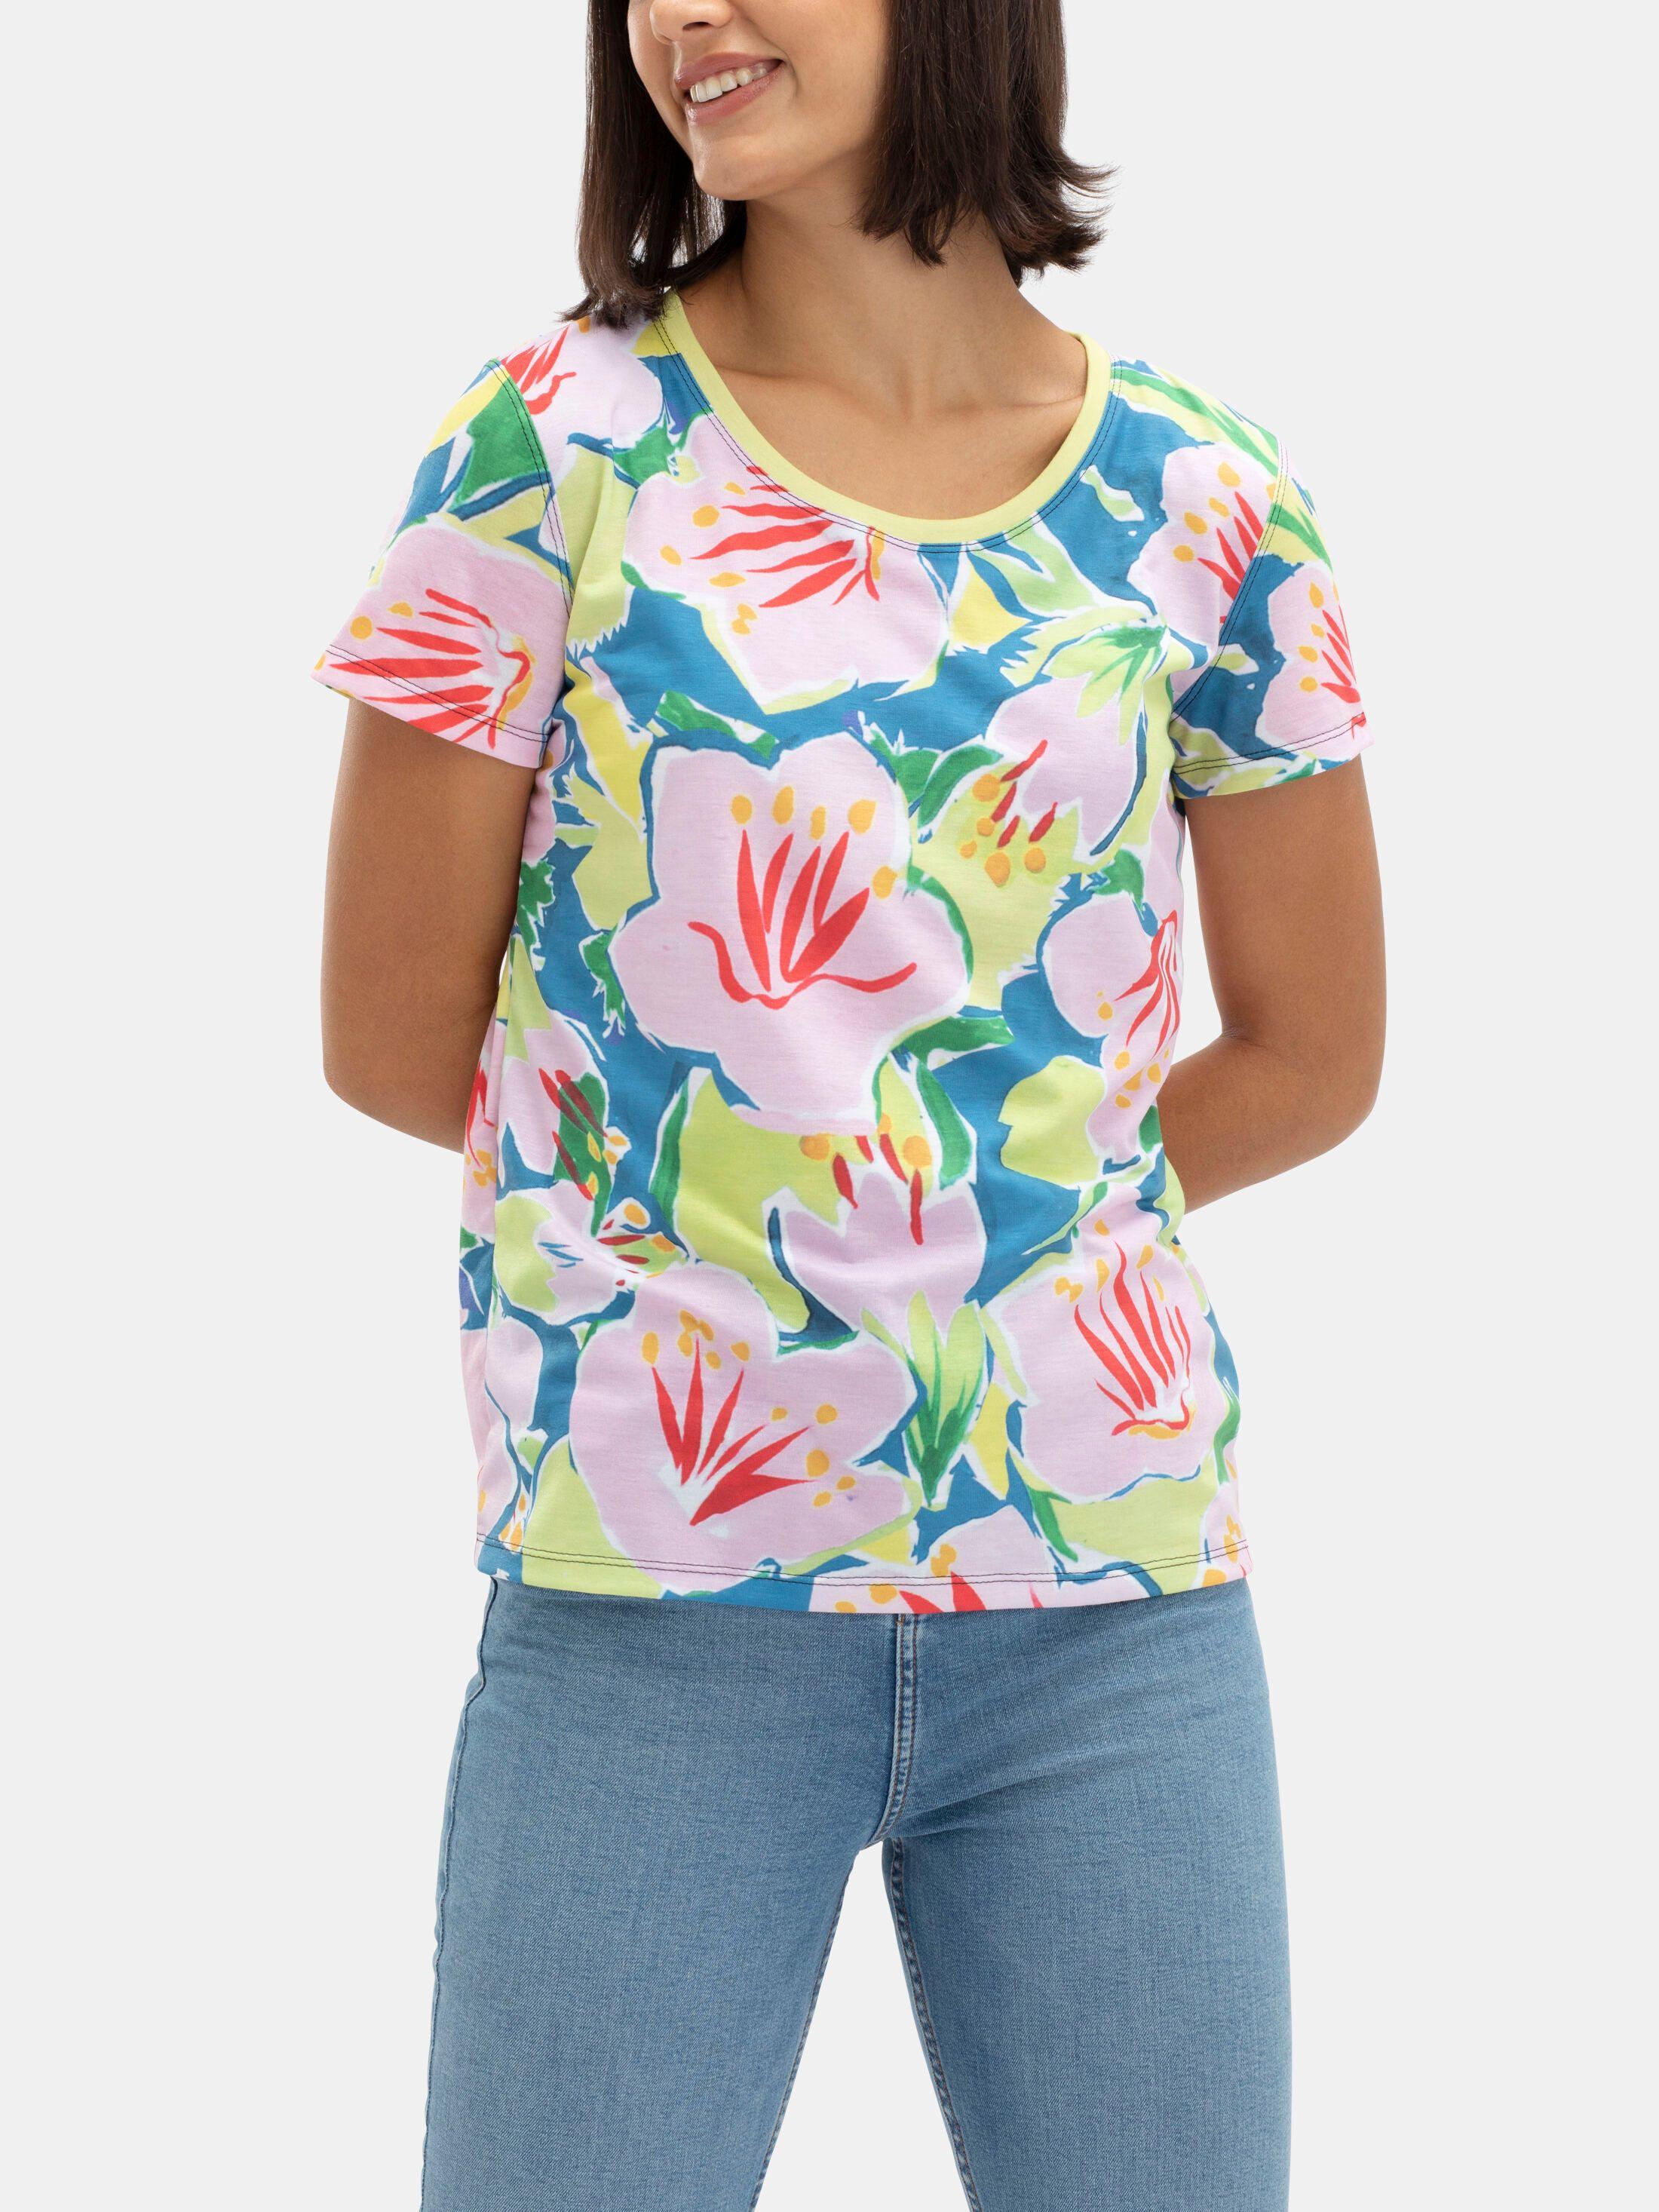 Create a women's basic custom cotton t-shirt